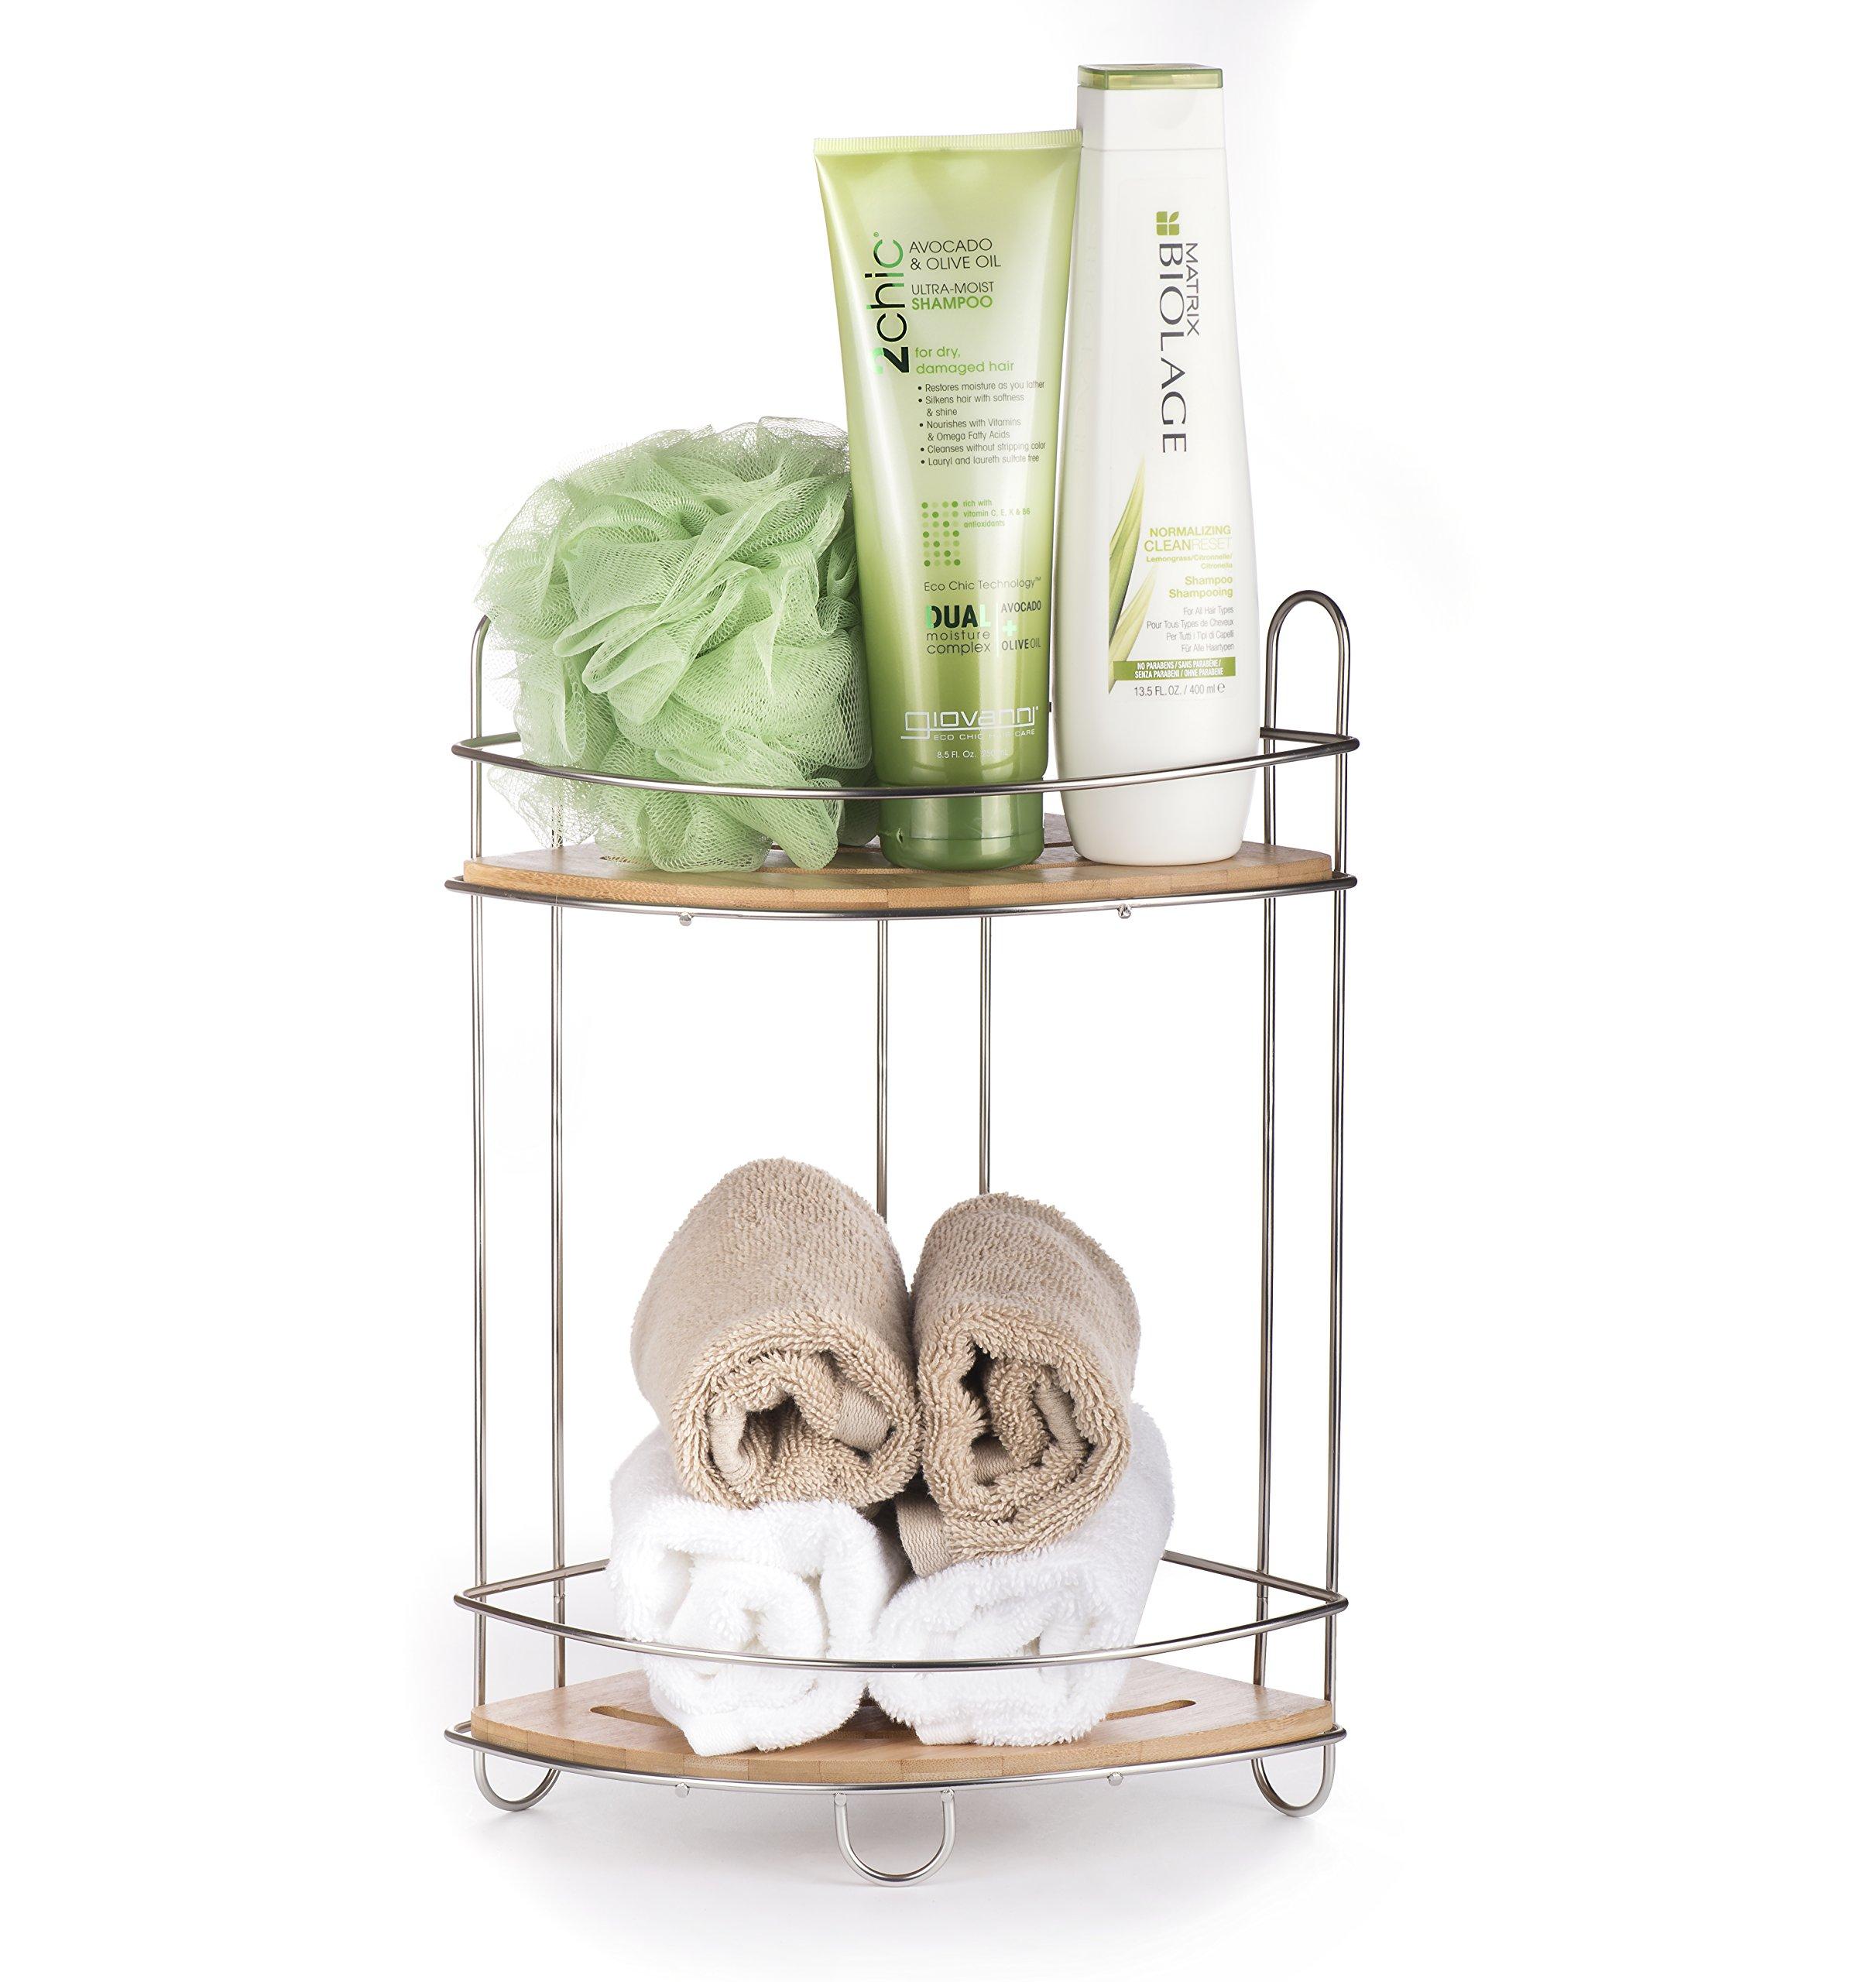 AMG and Enchante Accessories Free Standing Bathroom Spa Tower Storage Corner Caddy, FC100007 SNI, Satin Nickel